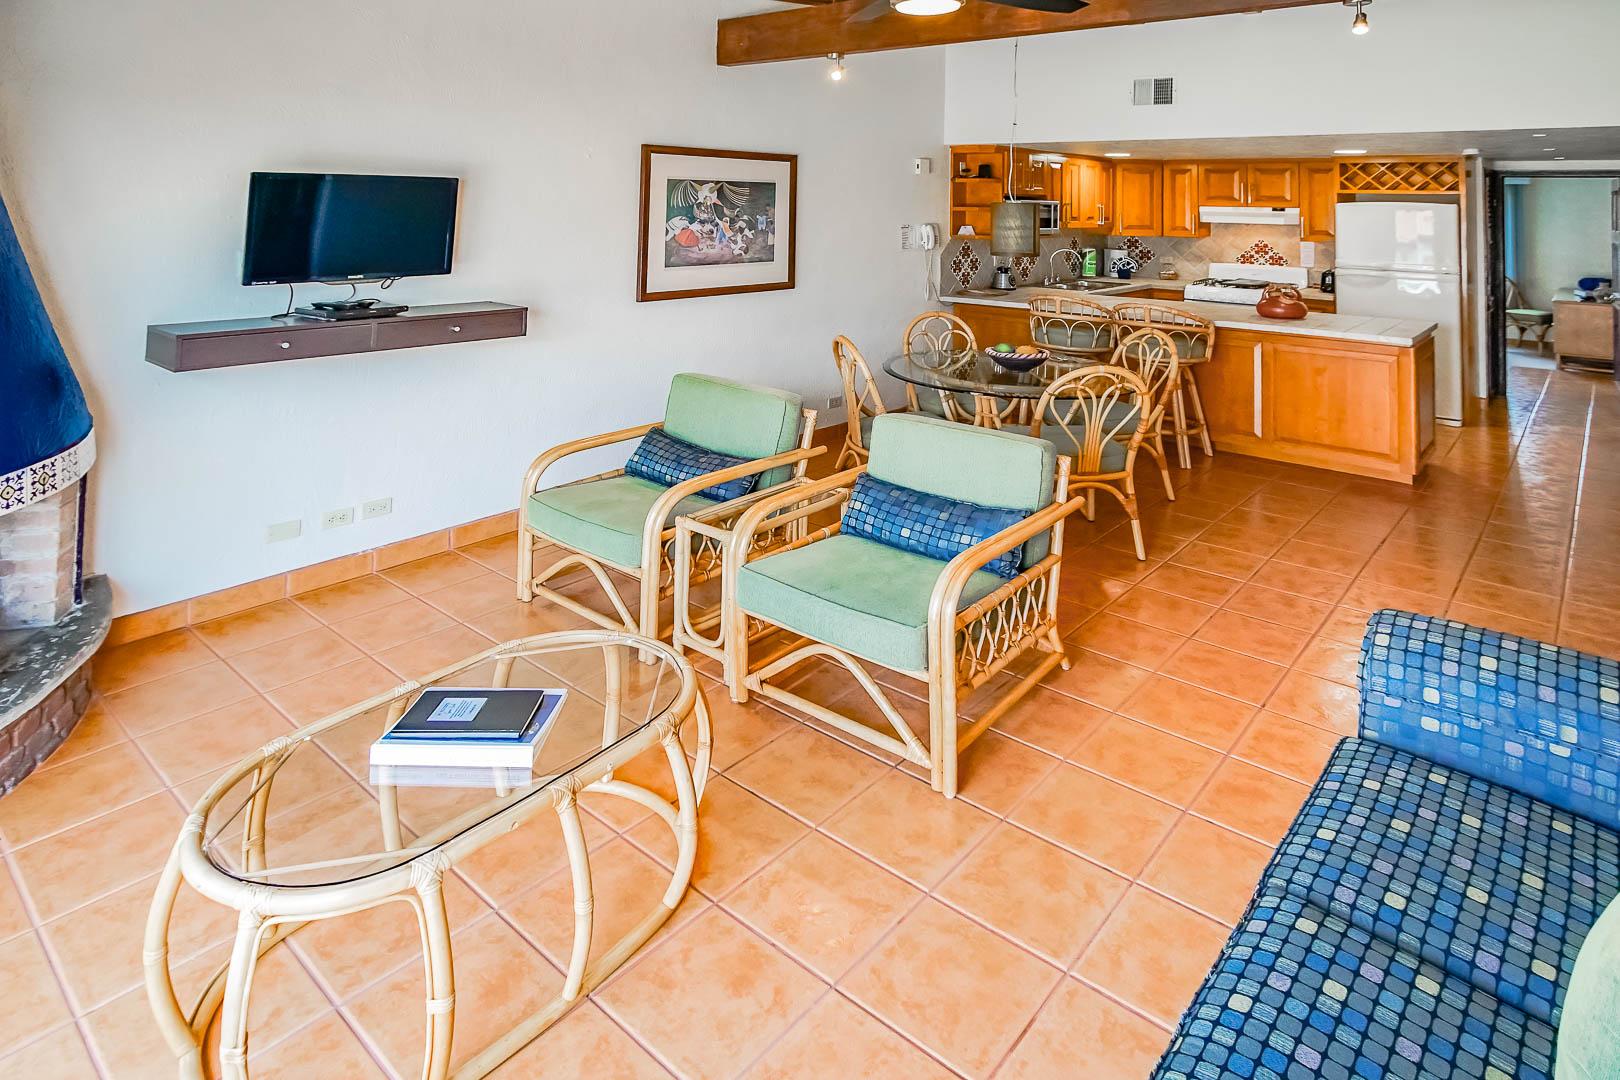 La Paloma - Living Room Area